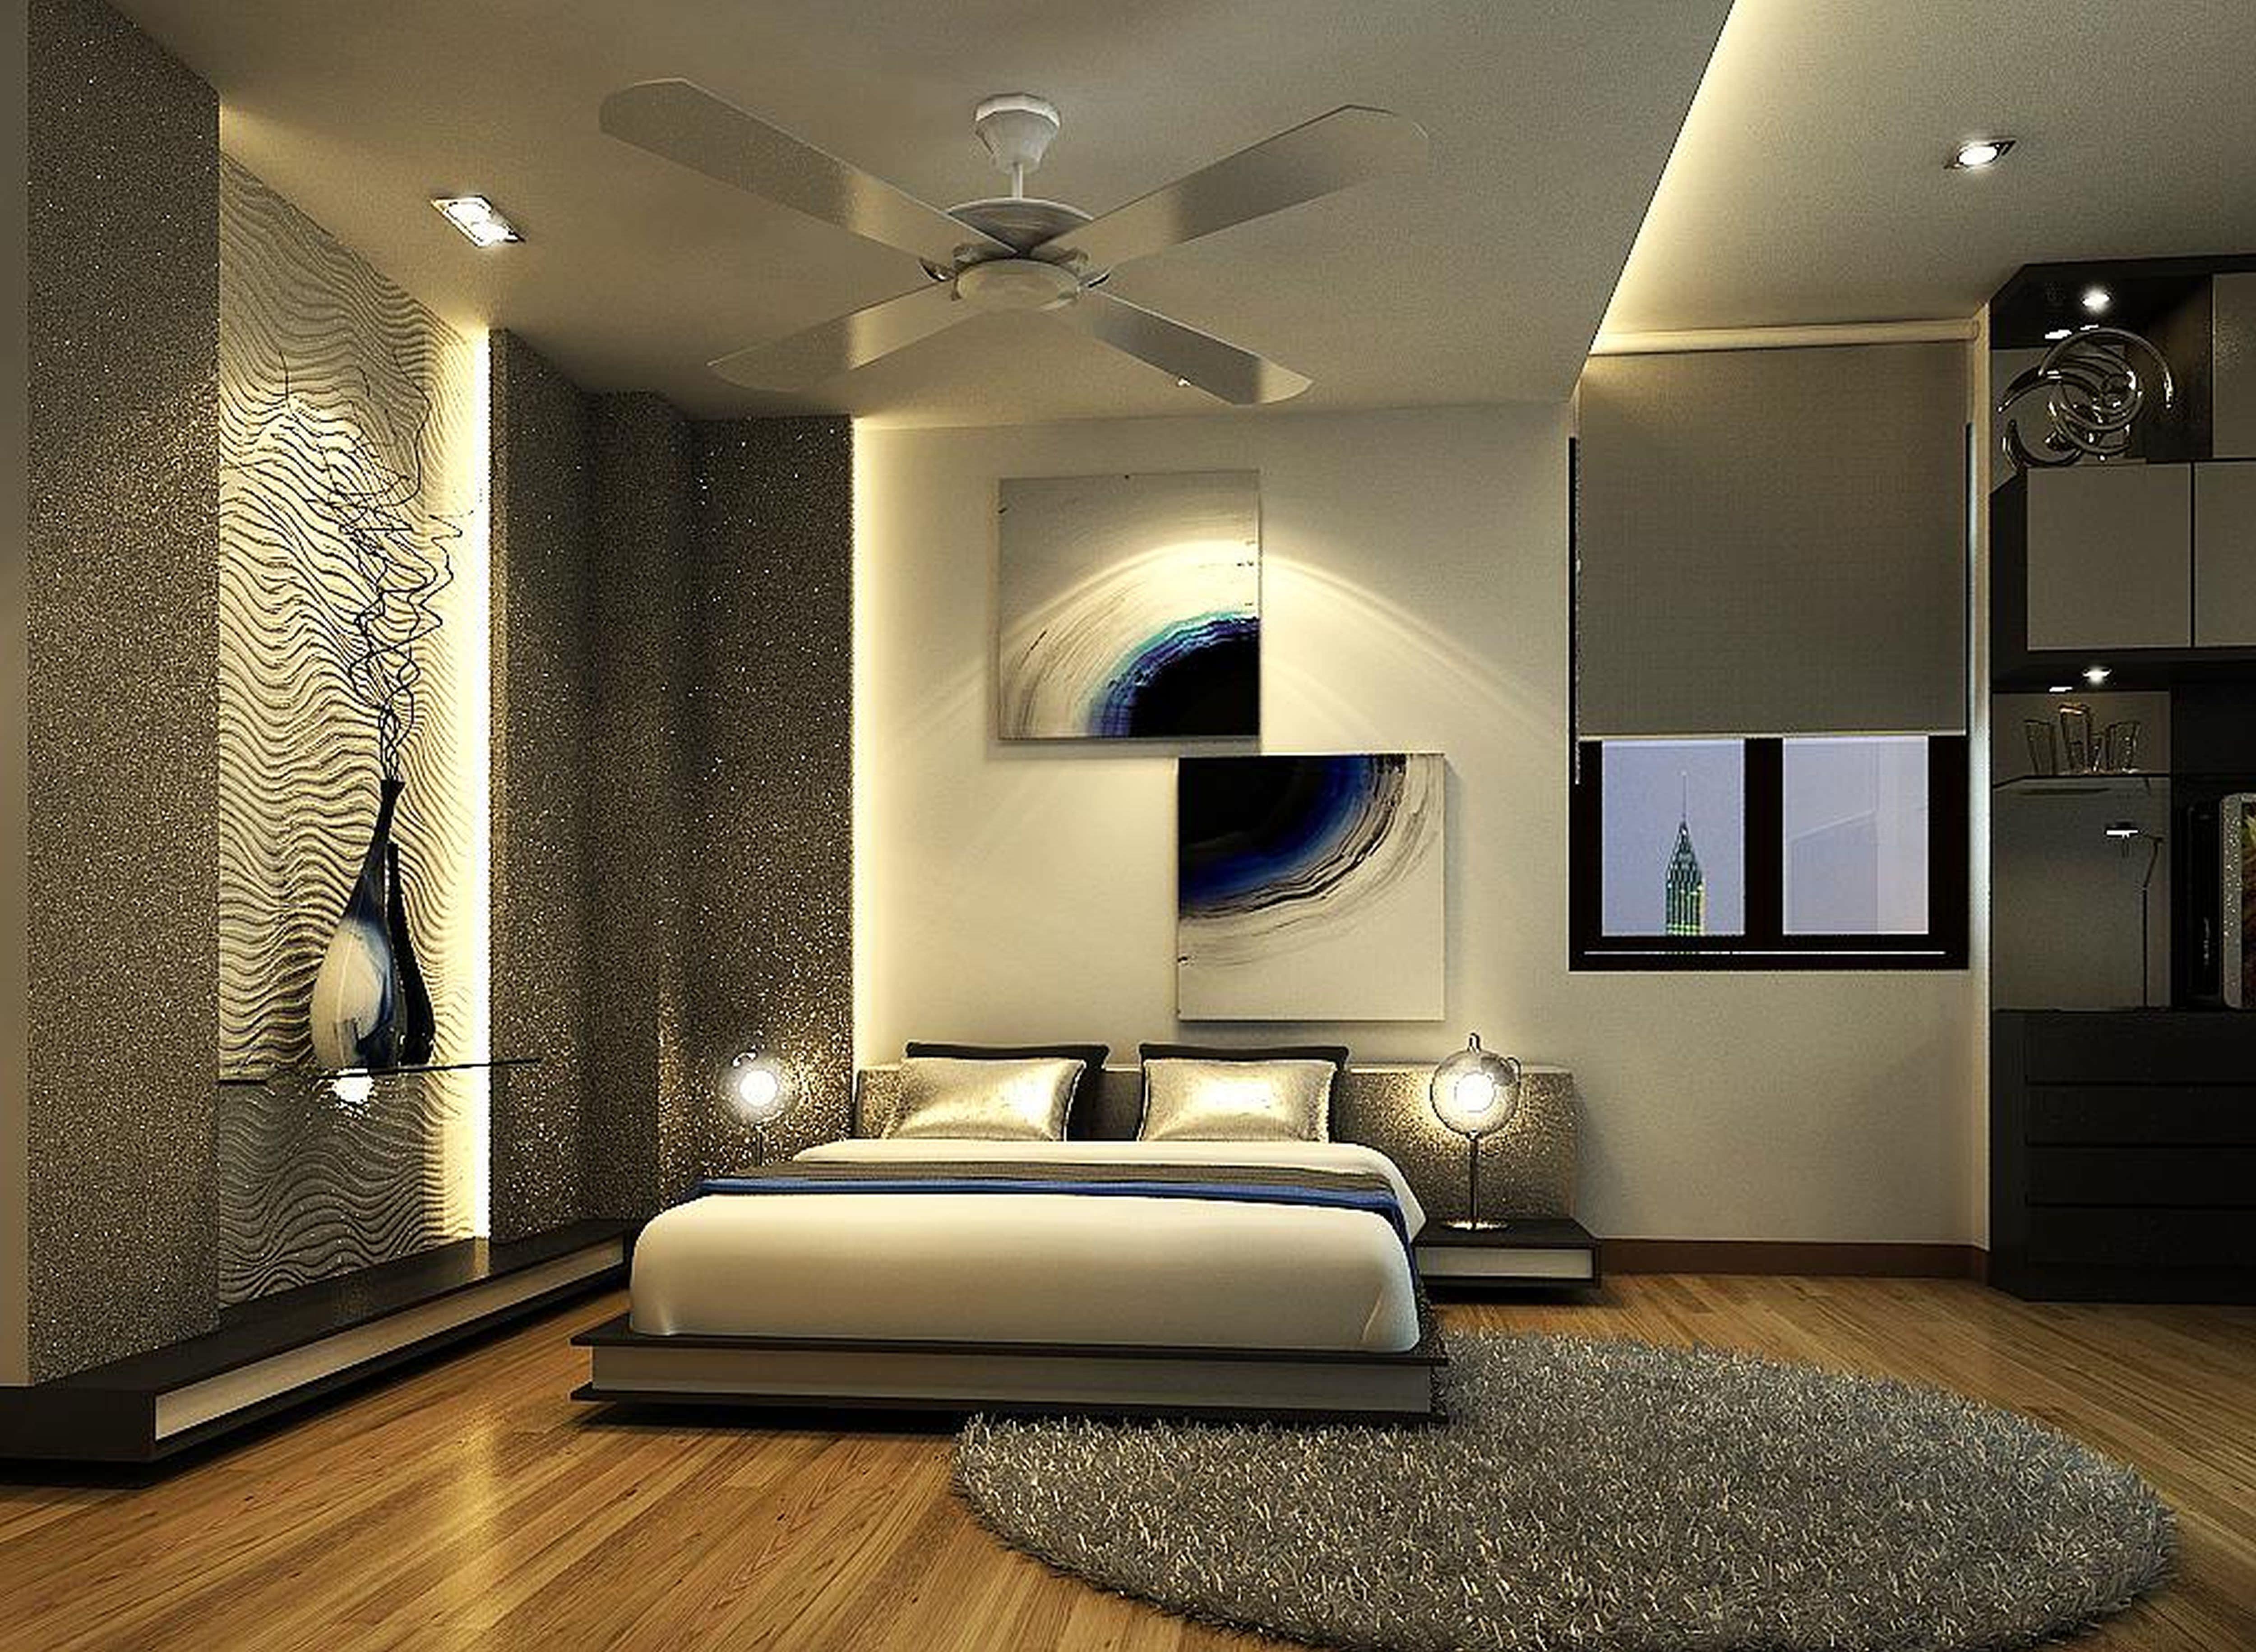 15+ Royal Bedroom Designs, Decorating Ideas | Design ... on Room Decor.  id=51487